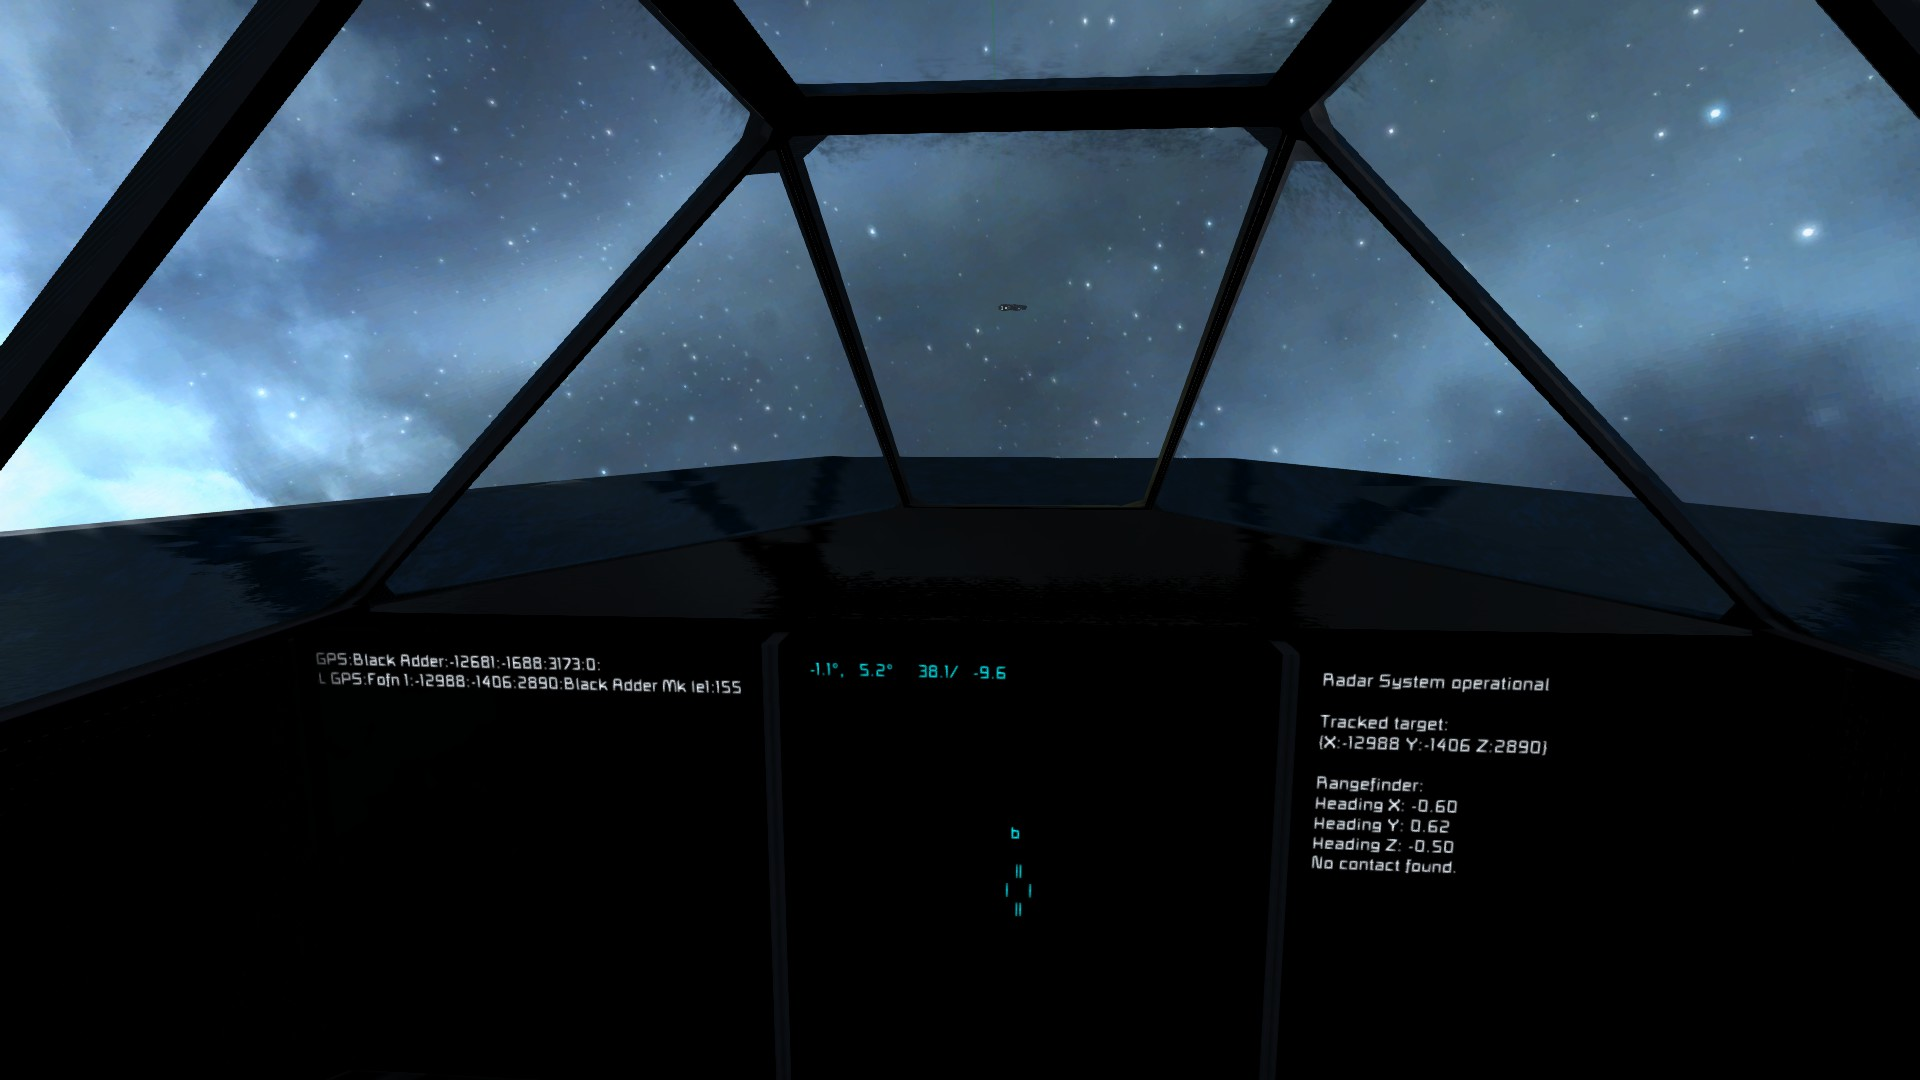 Entfernungsmessung Mit Radar : Se radar bildschirm keen software house forums